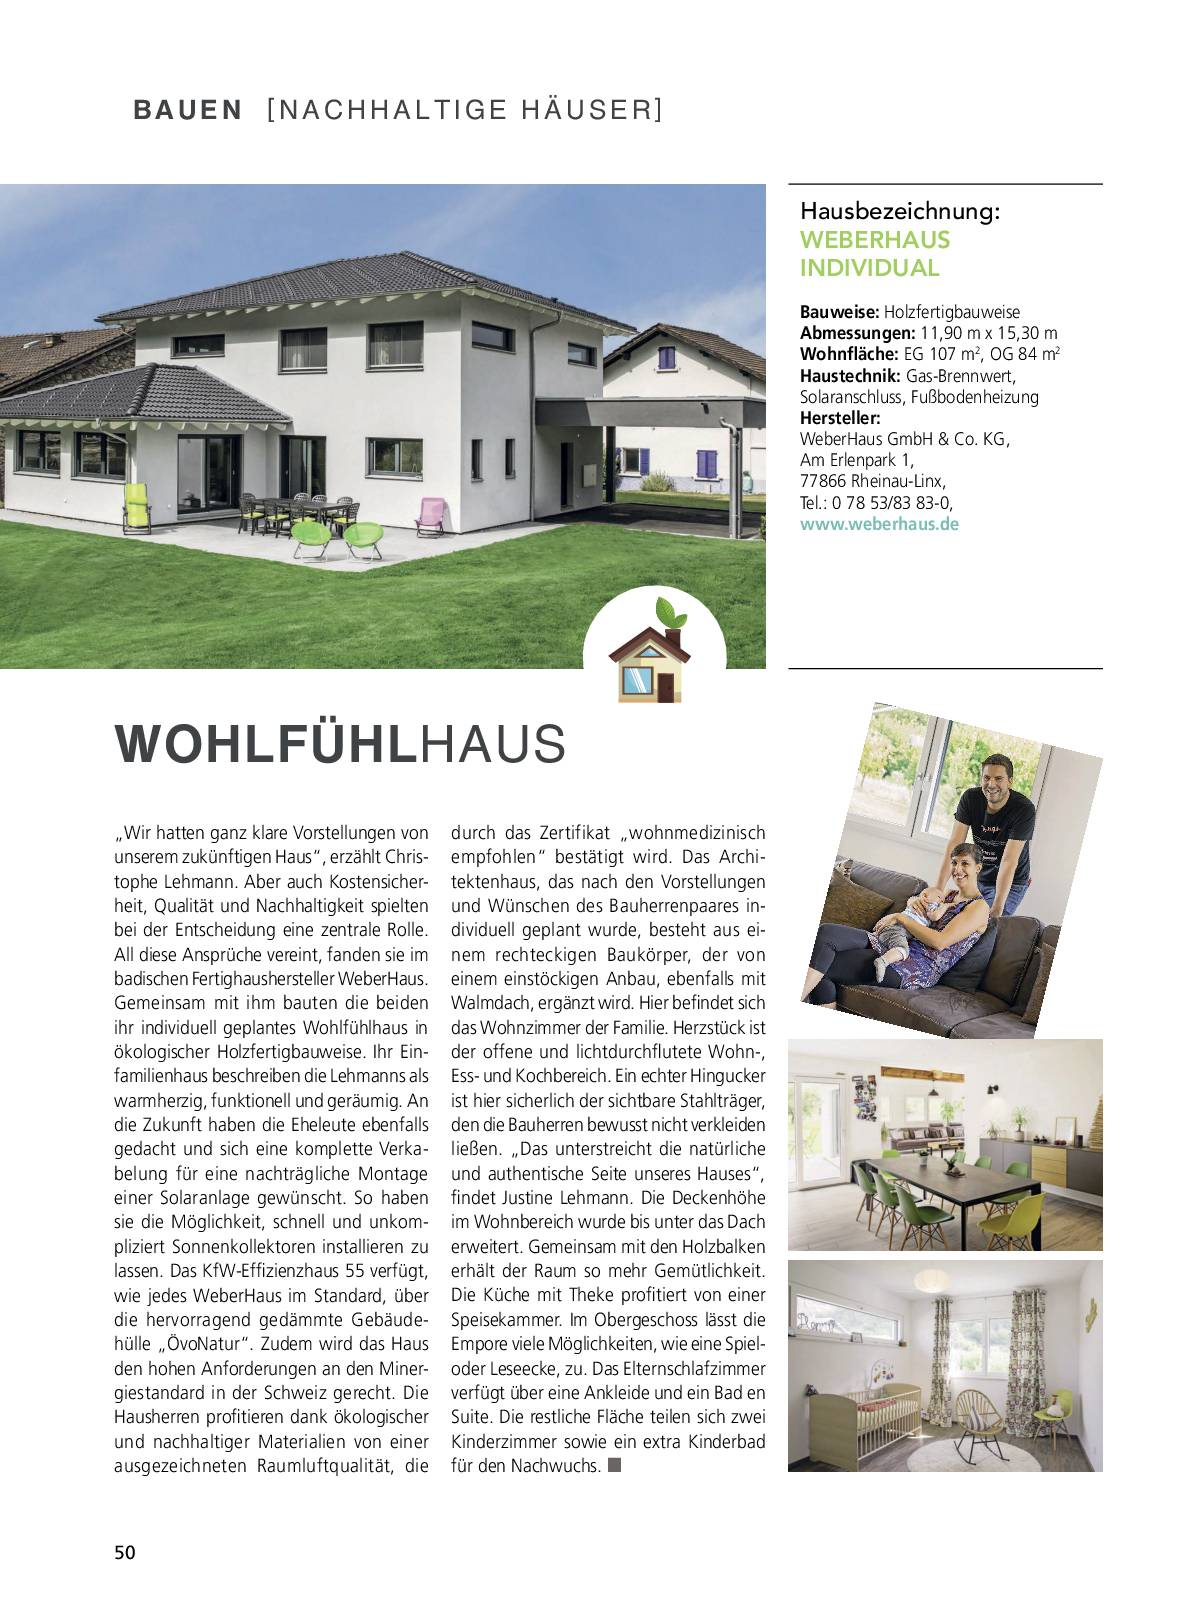 Haus + Mensch 03 2019